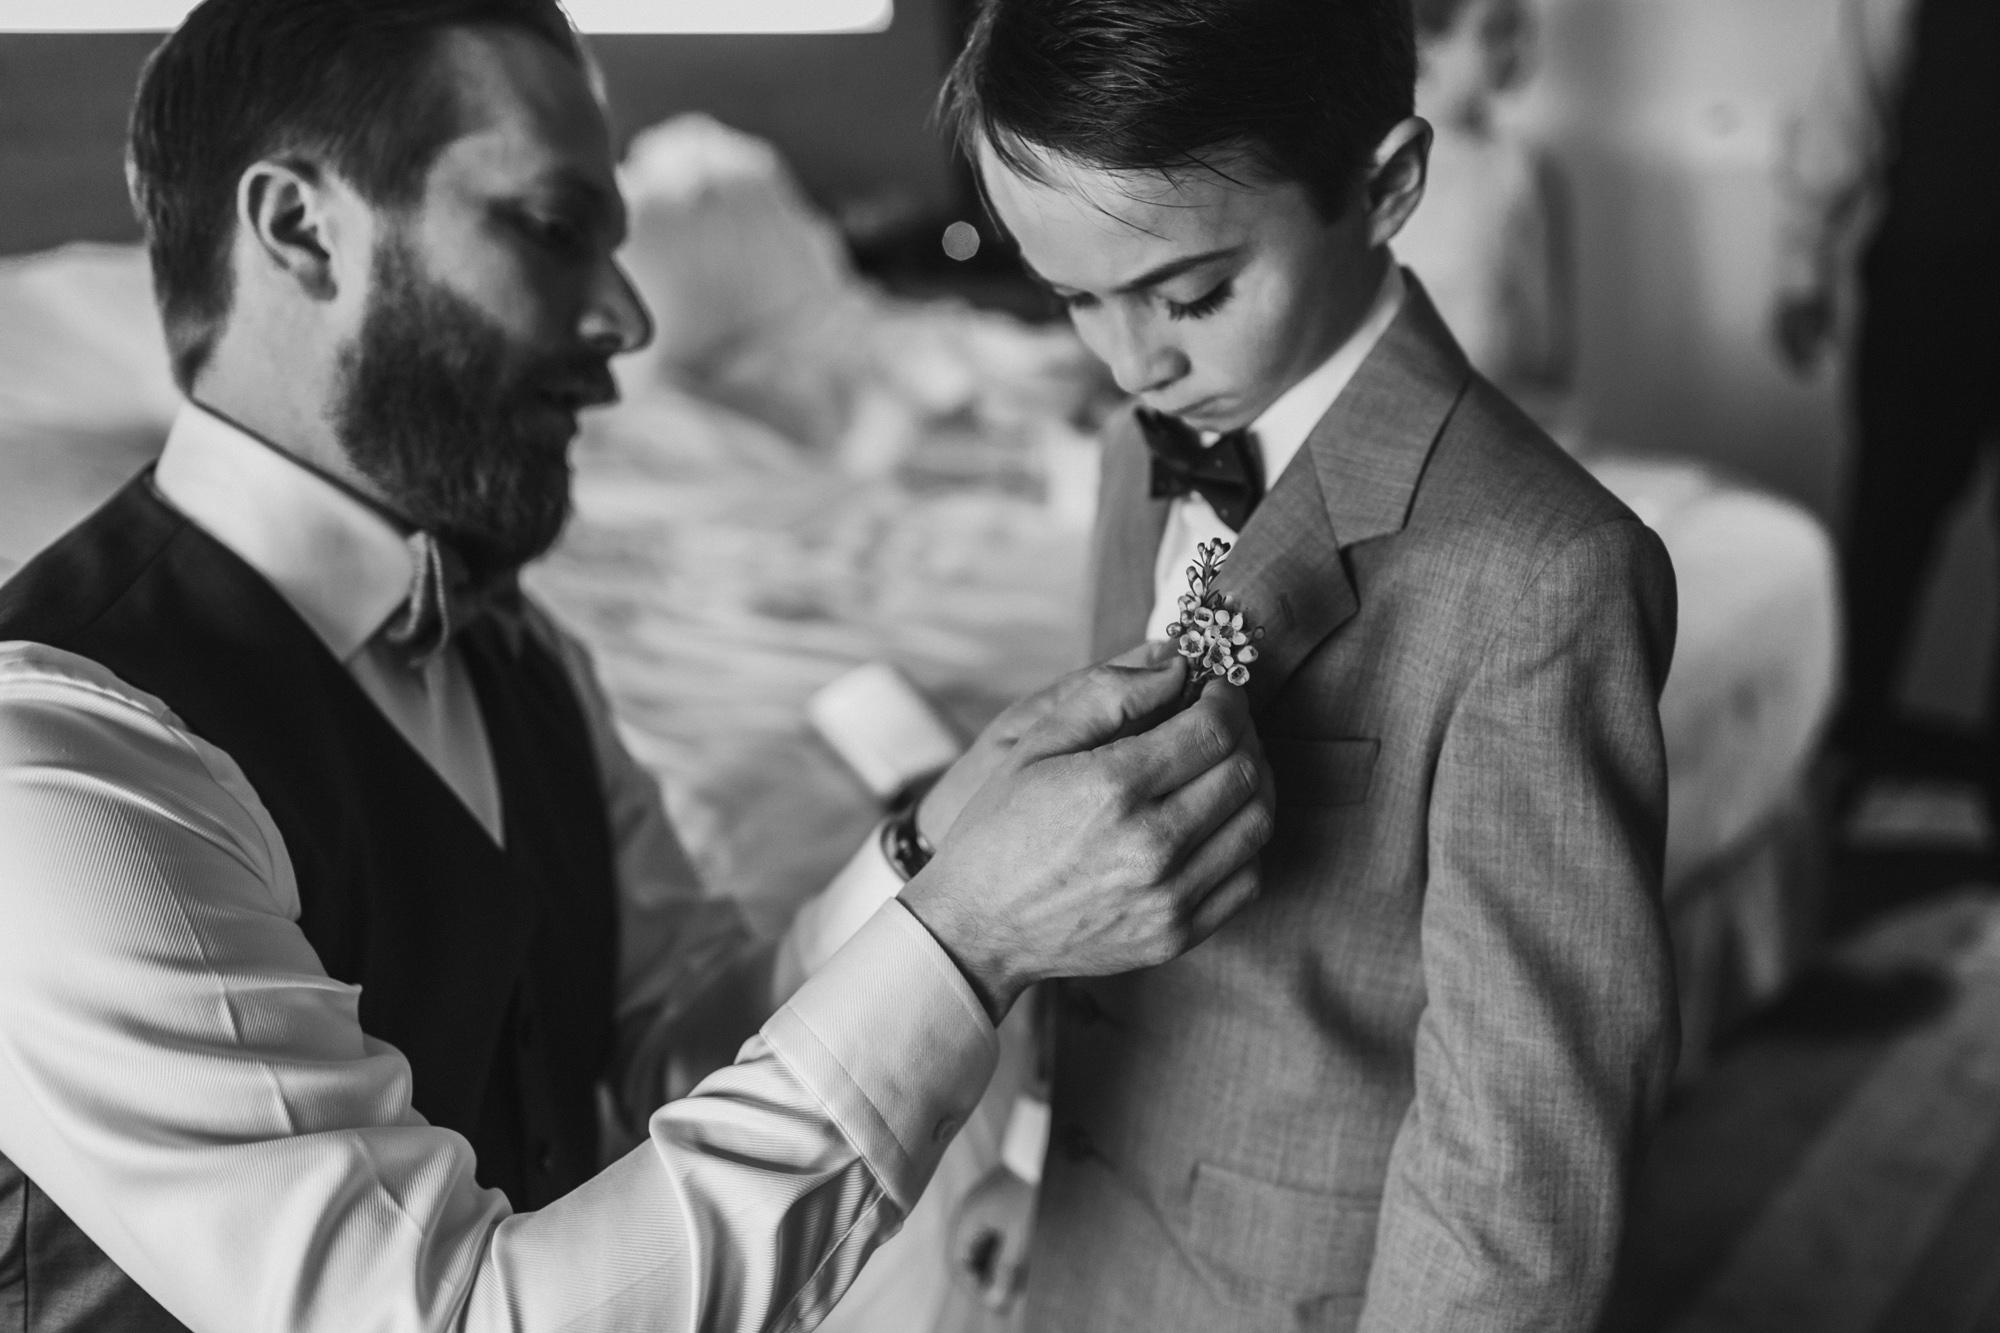 Helping his nephew get dressed up